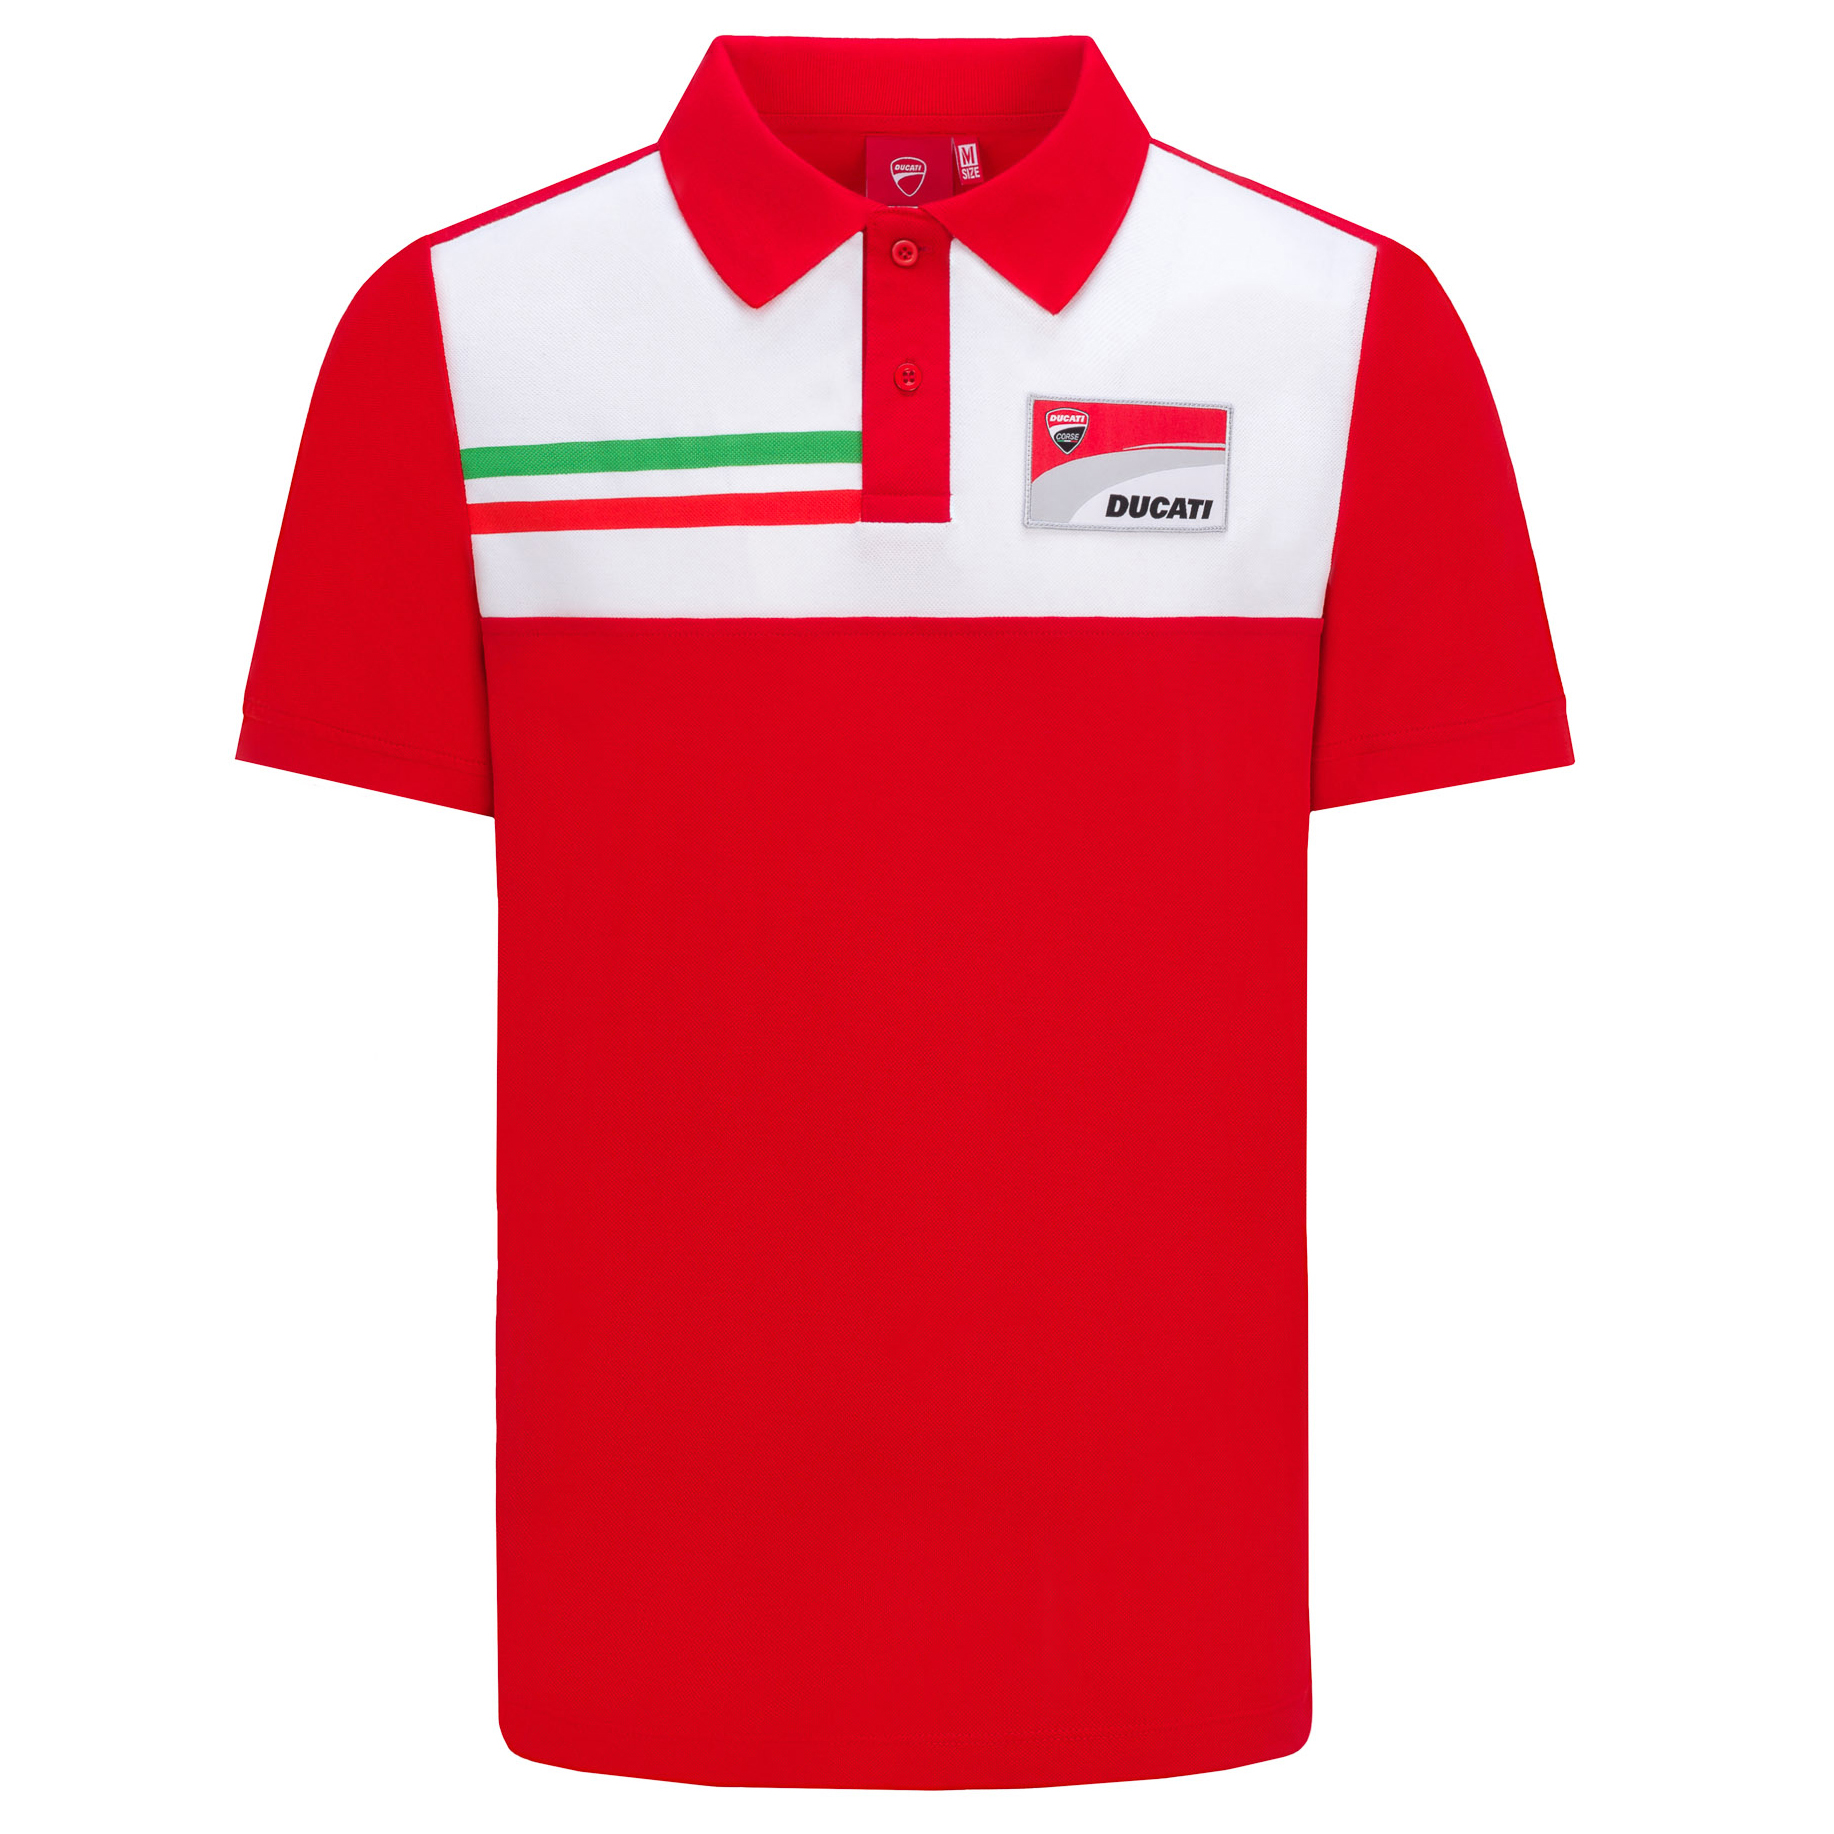 2019 Ducati Corse Racing Motogp Mens Classic Polo Shirt 100 Cotton Red White Male Tifoso F1 Merchandise F1 Store